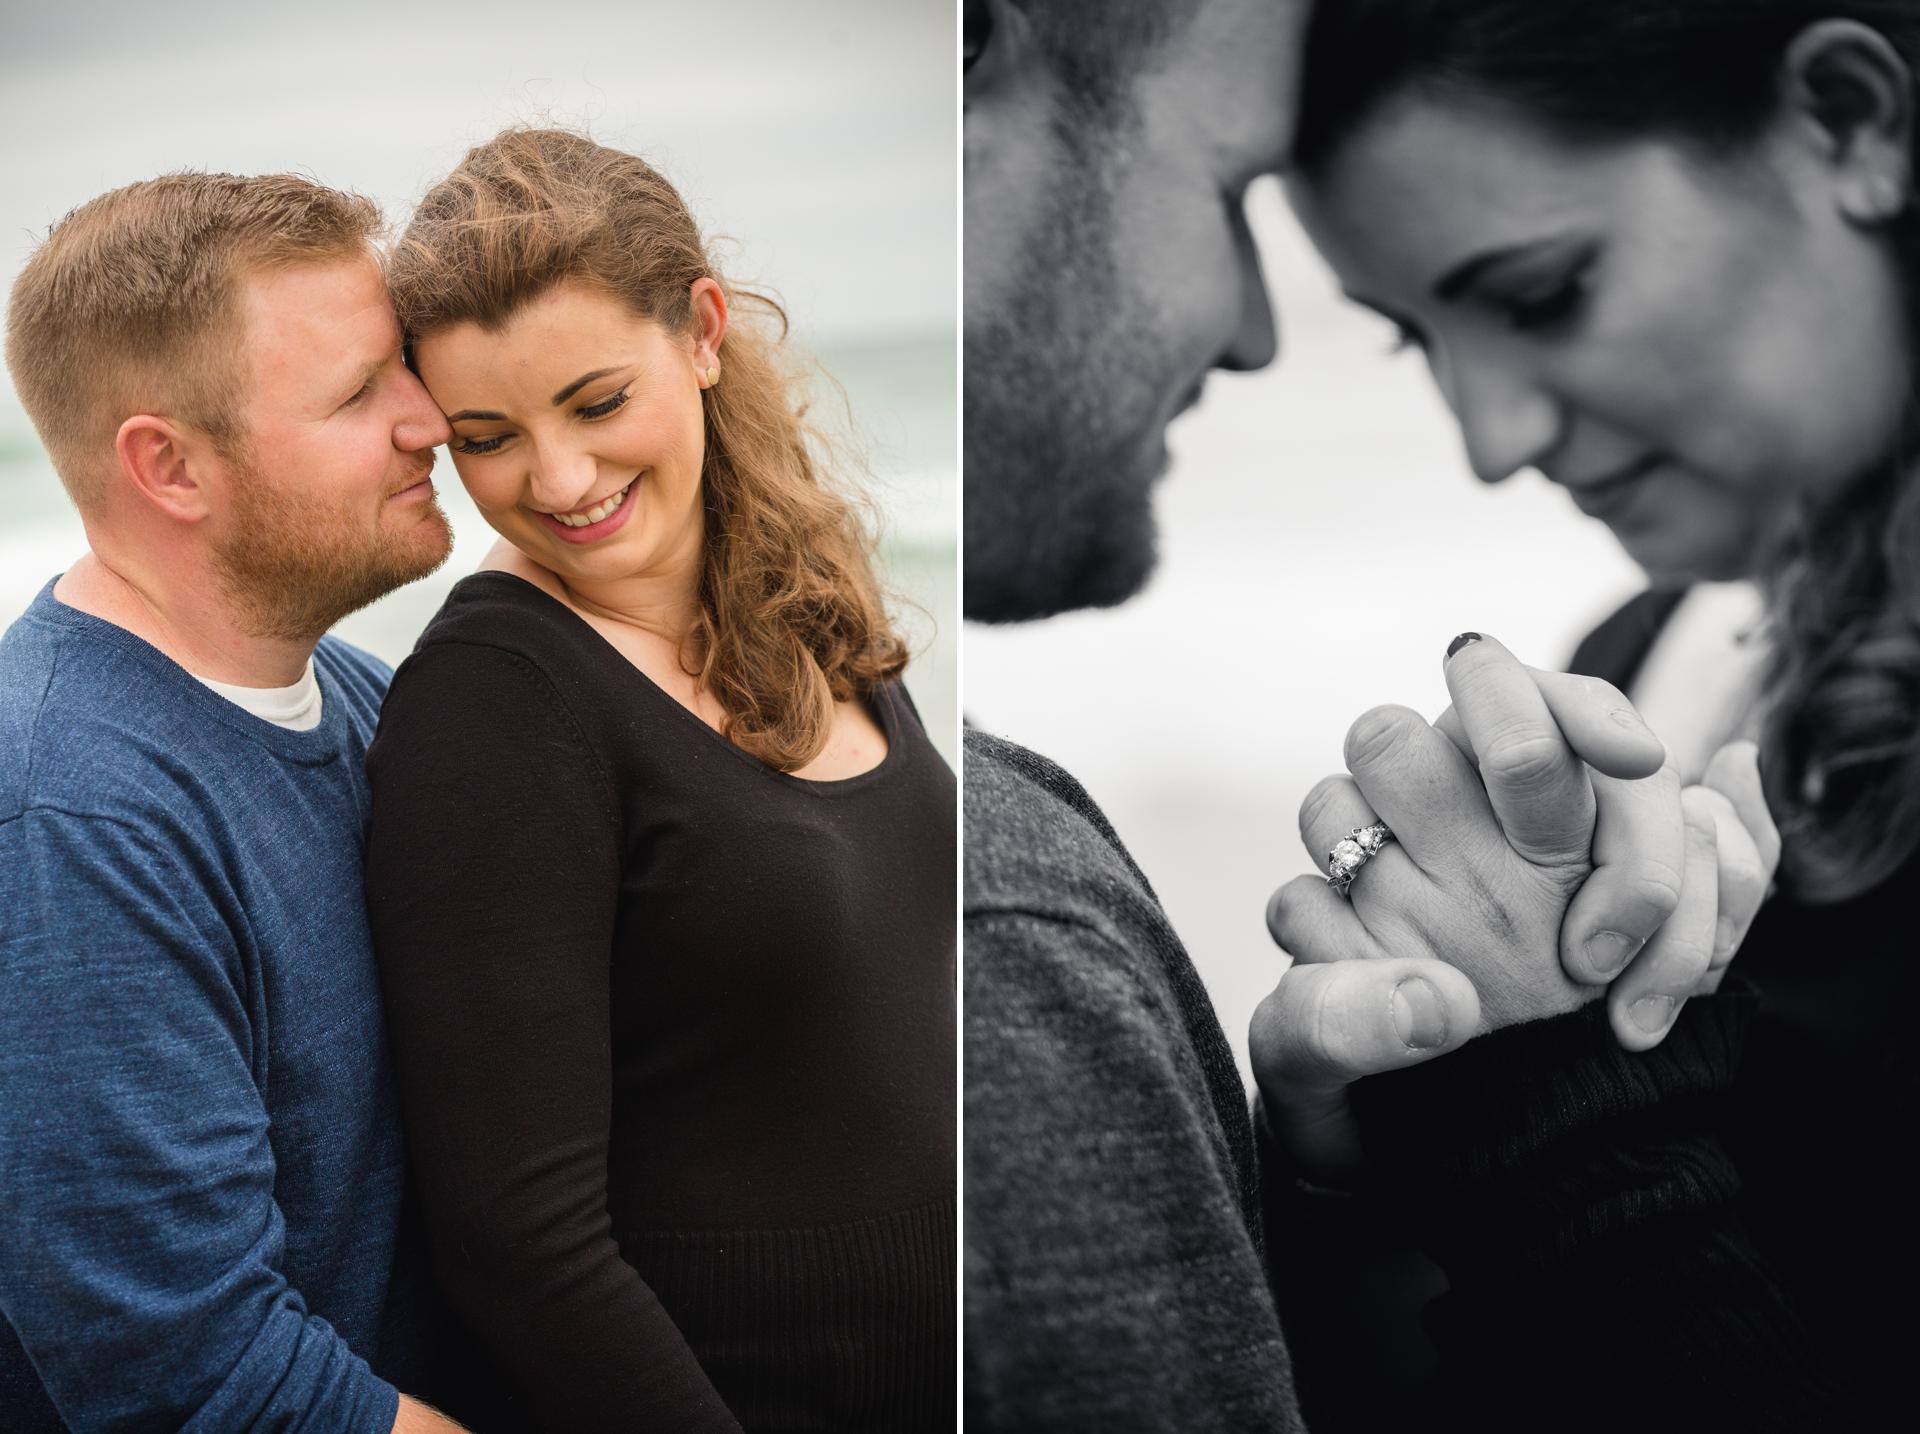 Engagement Proposal La Jolla Photographer